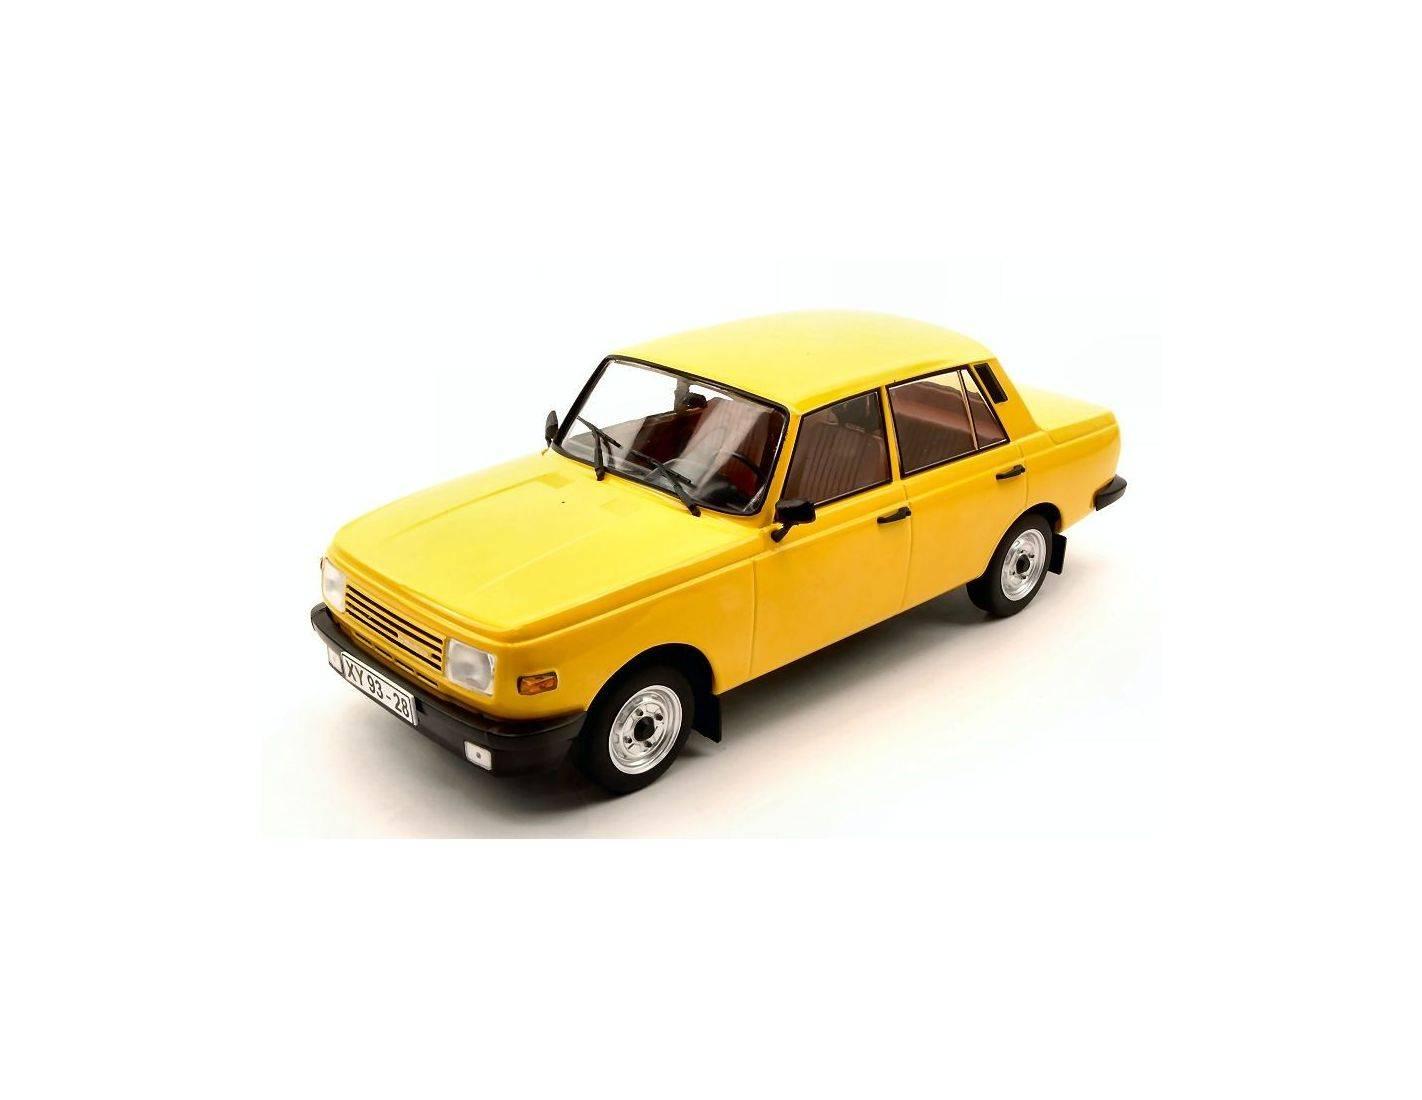 Mac due mcg18077 wartburg 353 1966 yellow 1 18 modellino for Mac due the box